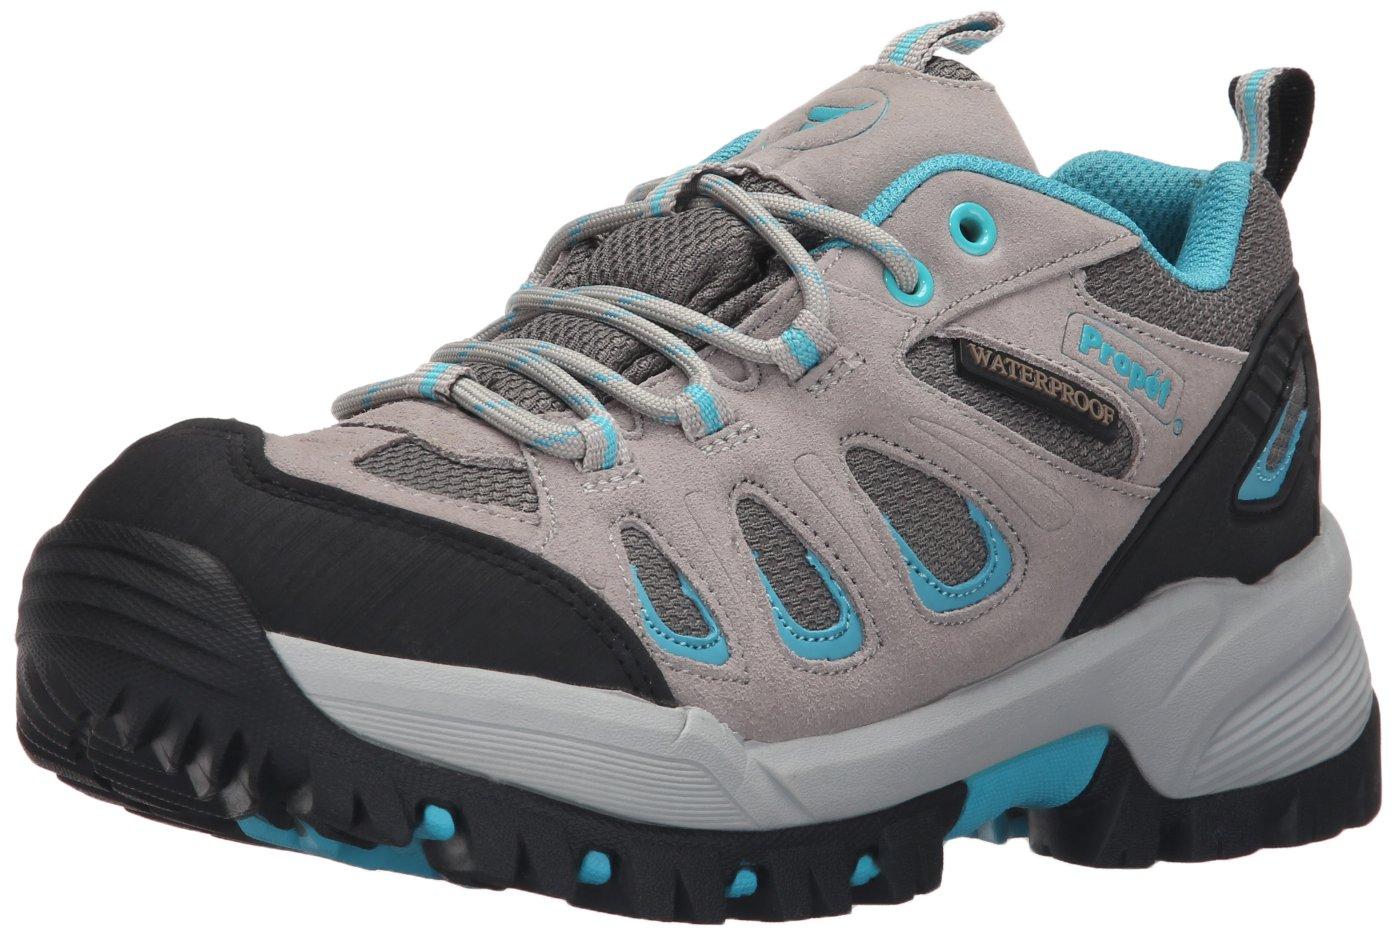 Propet Women's Ridgewalker Low Boot B01AYQ6P9Y 8.5 2E US|Light Grey/Turquoise